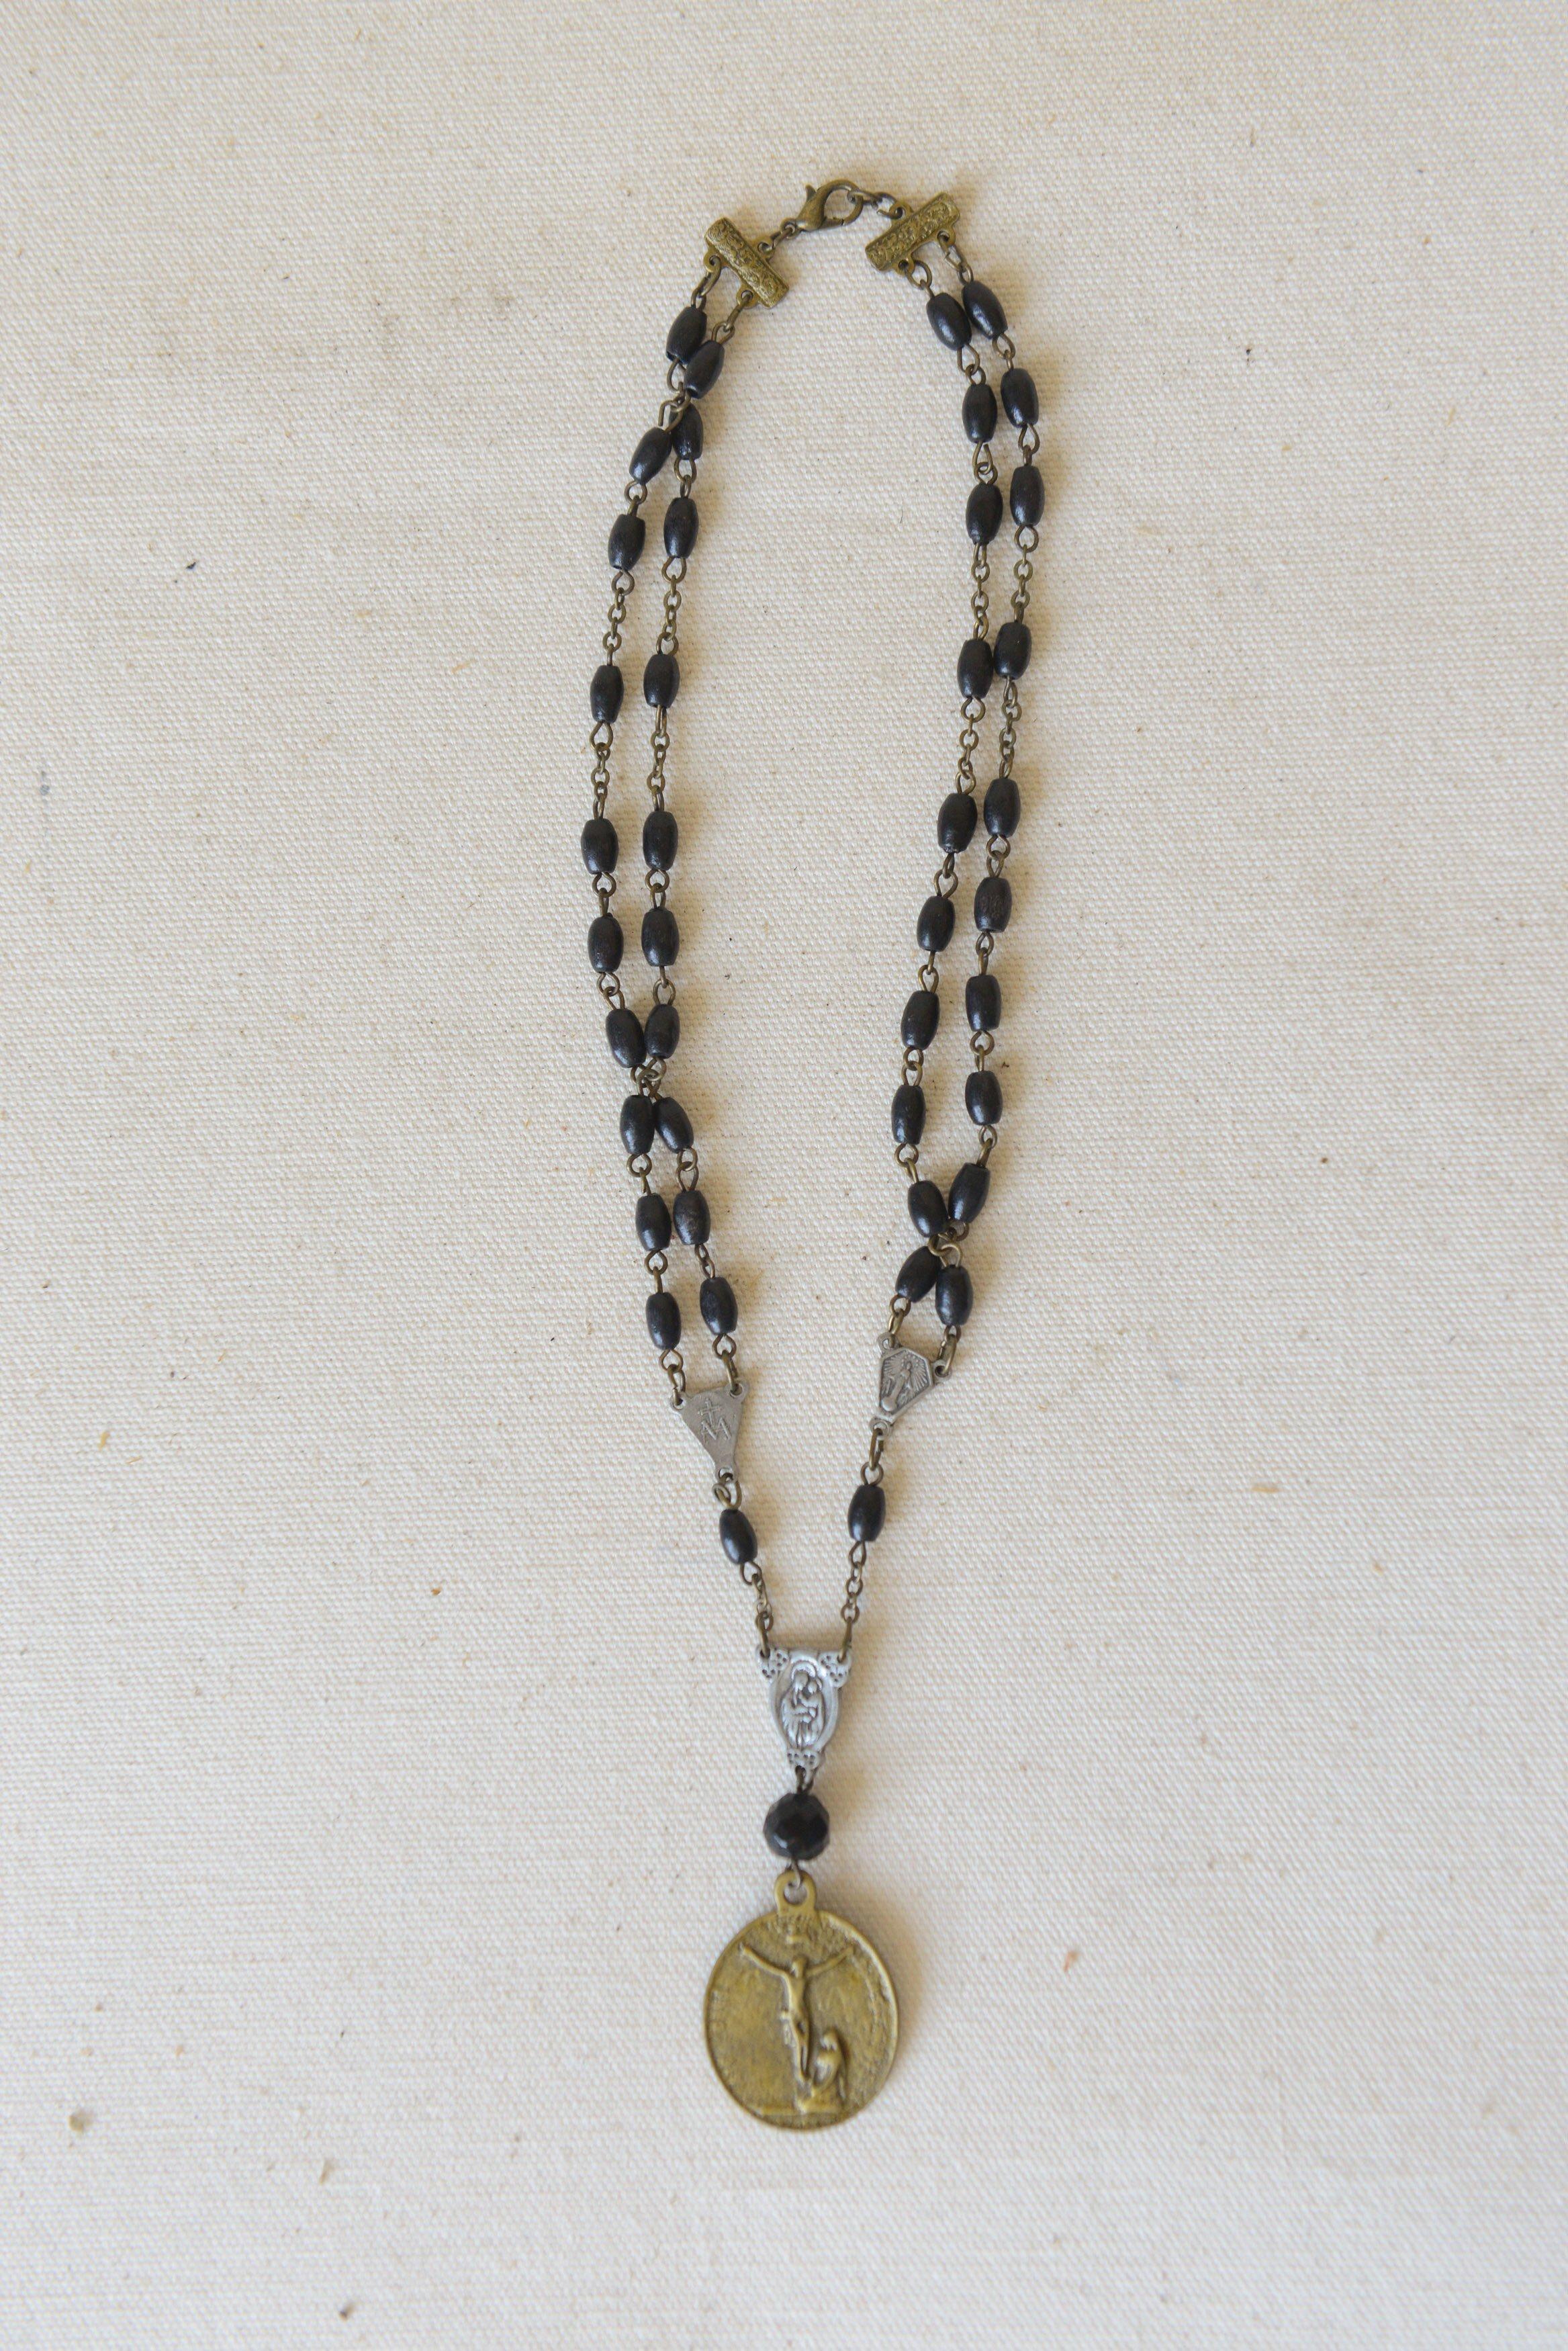 Crucifixion Necklace